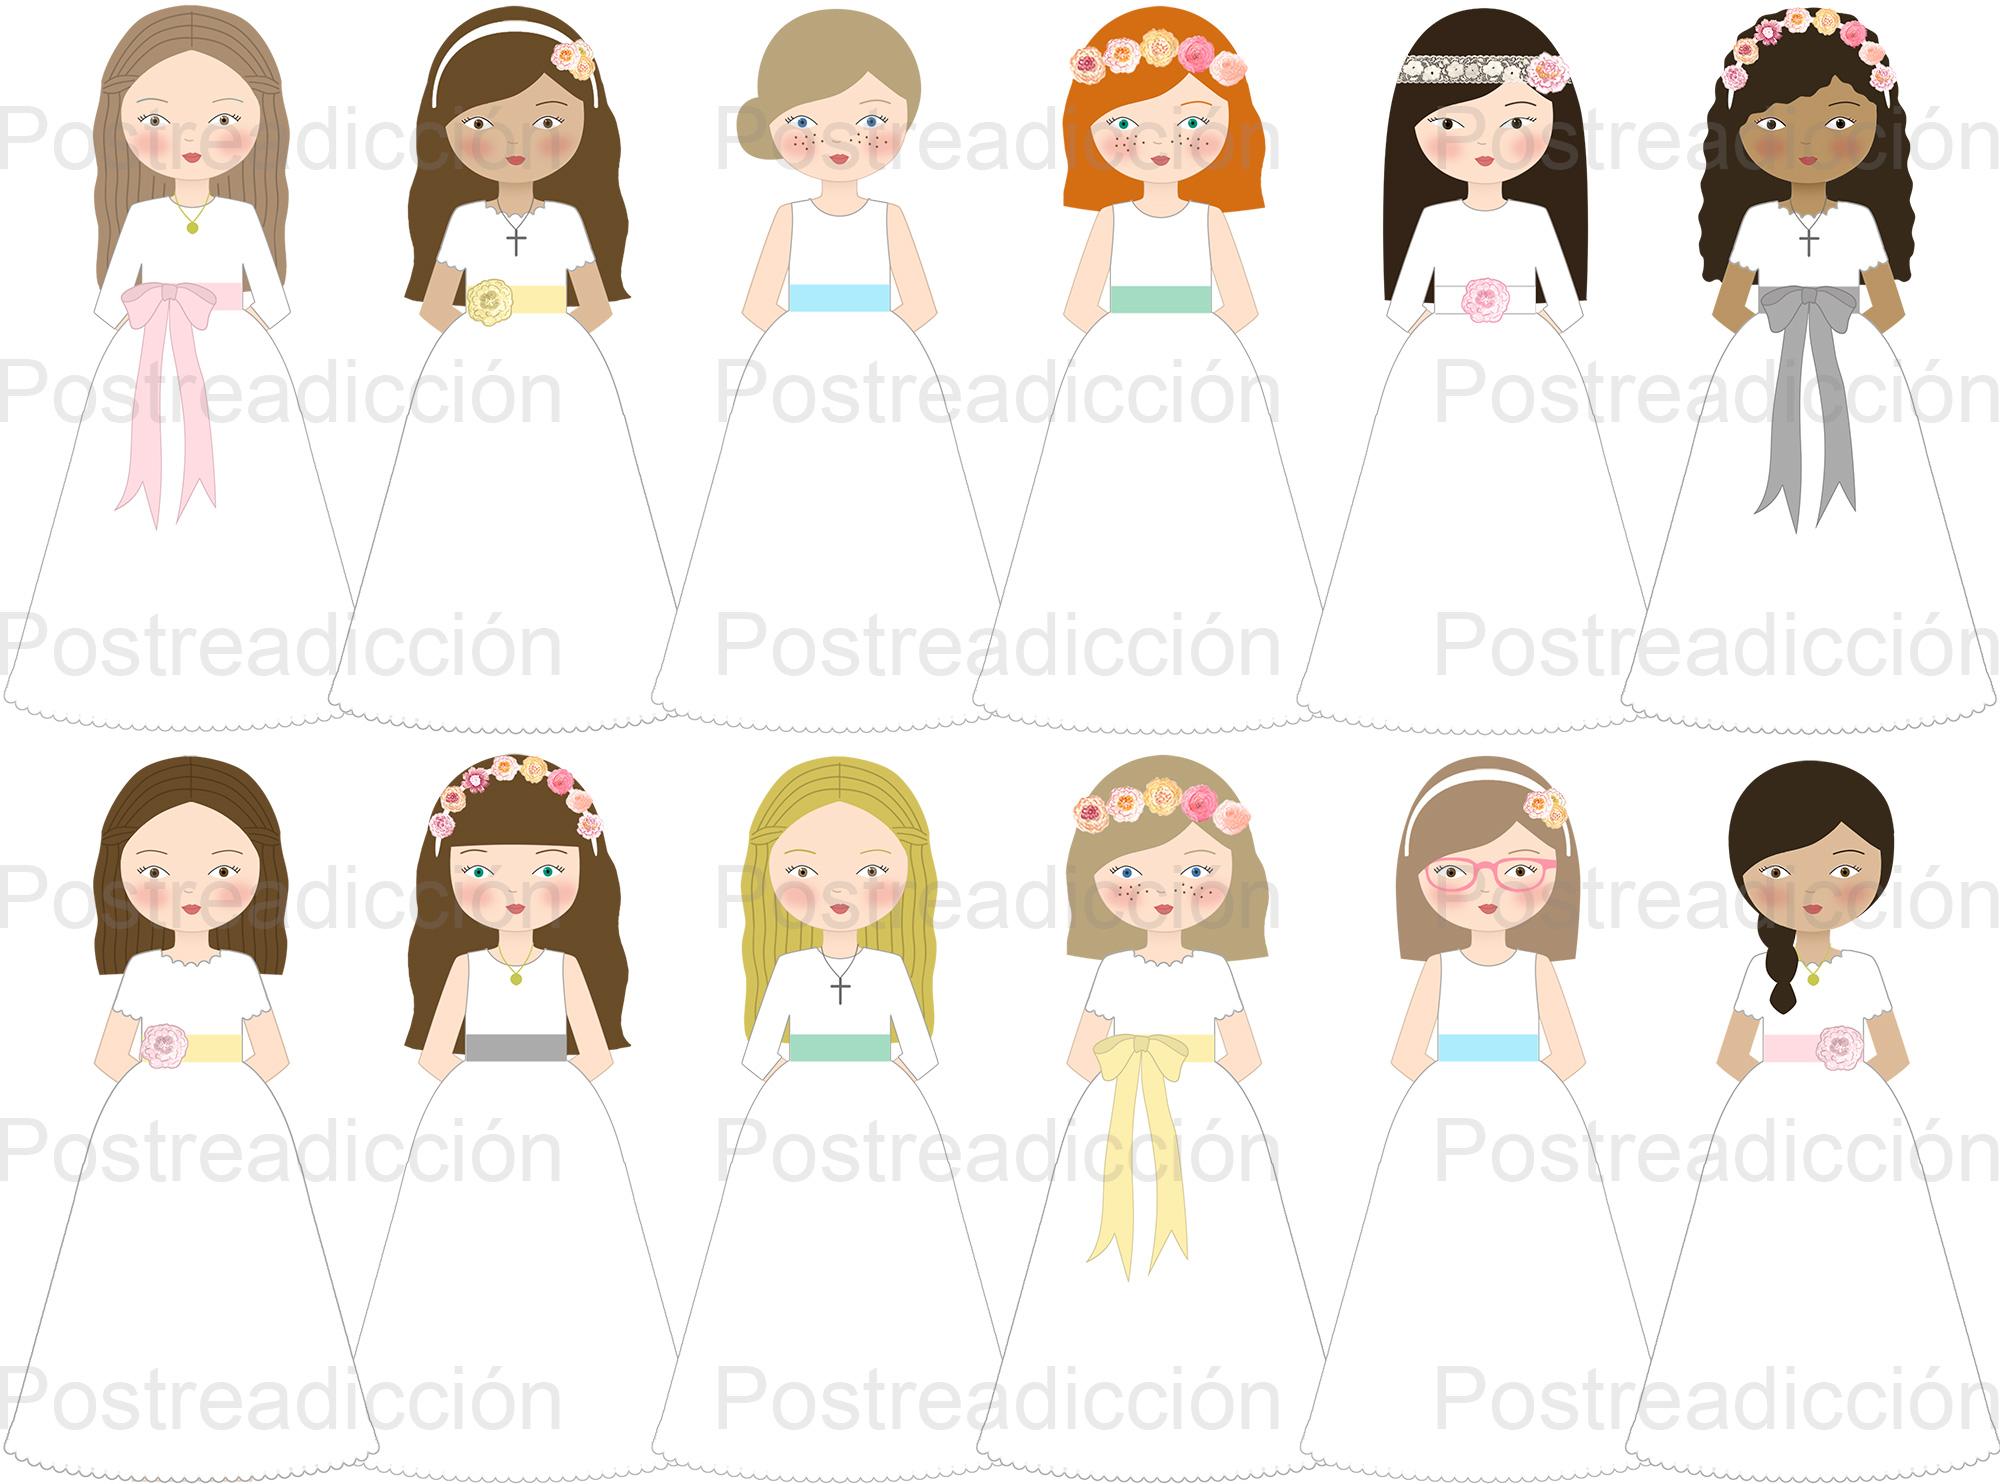 Imagen de producto: https://tienda.postreadiccion.com/img/articulos/secundarias13521-kit-imprimible-de-comunion-carlota-flores-azules-1.jpg